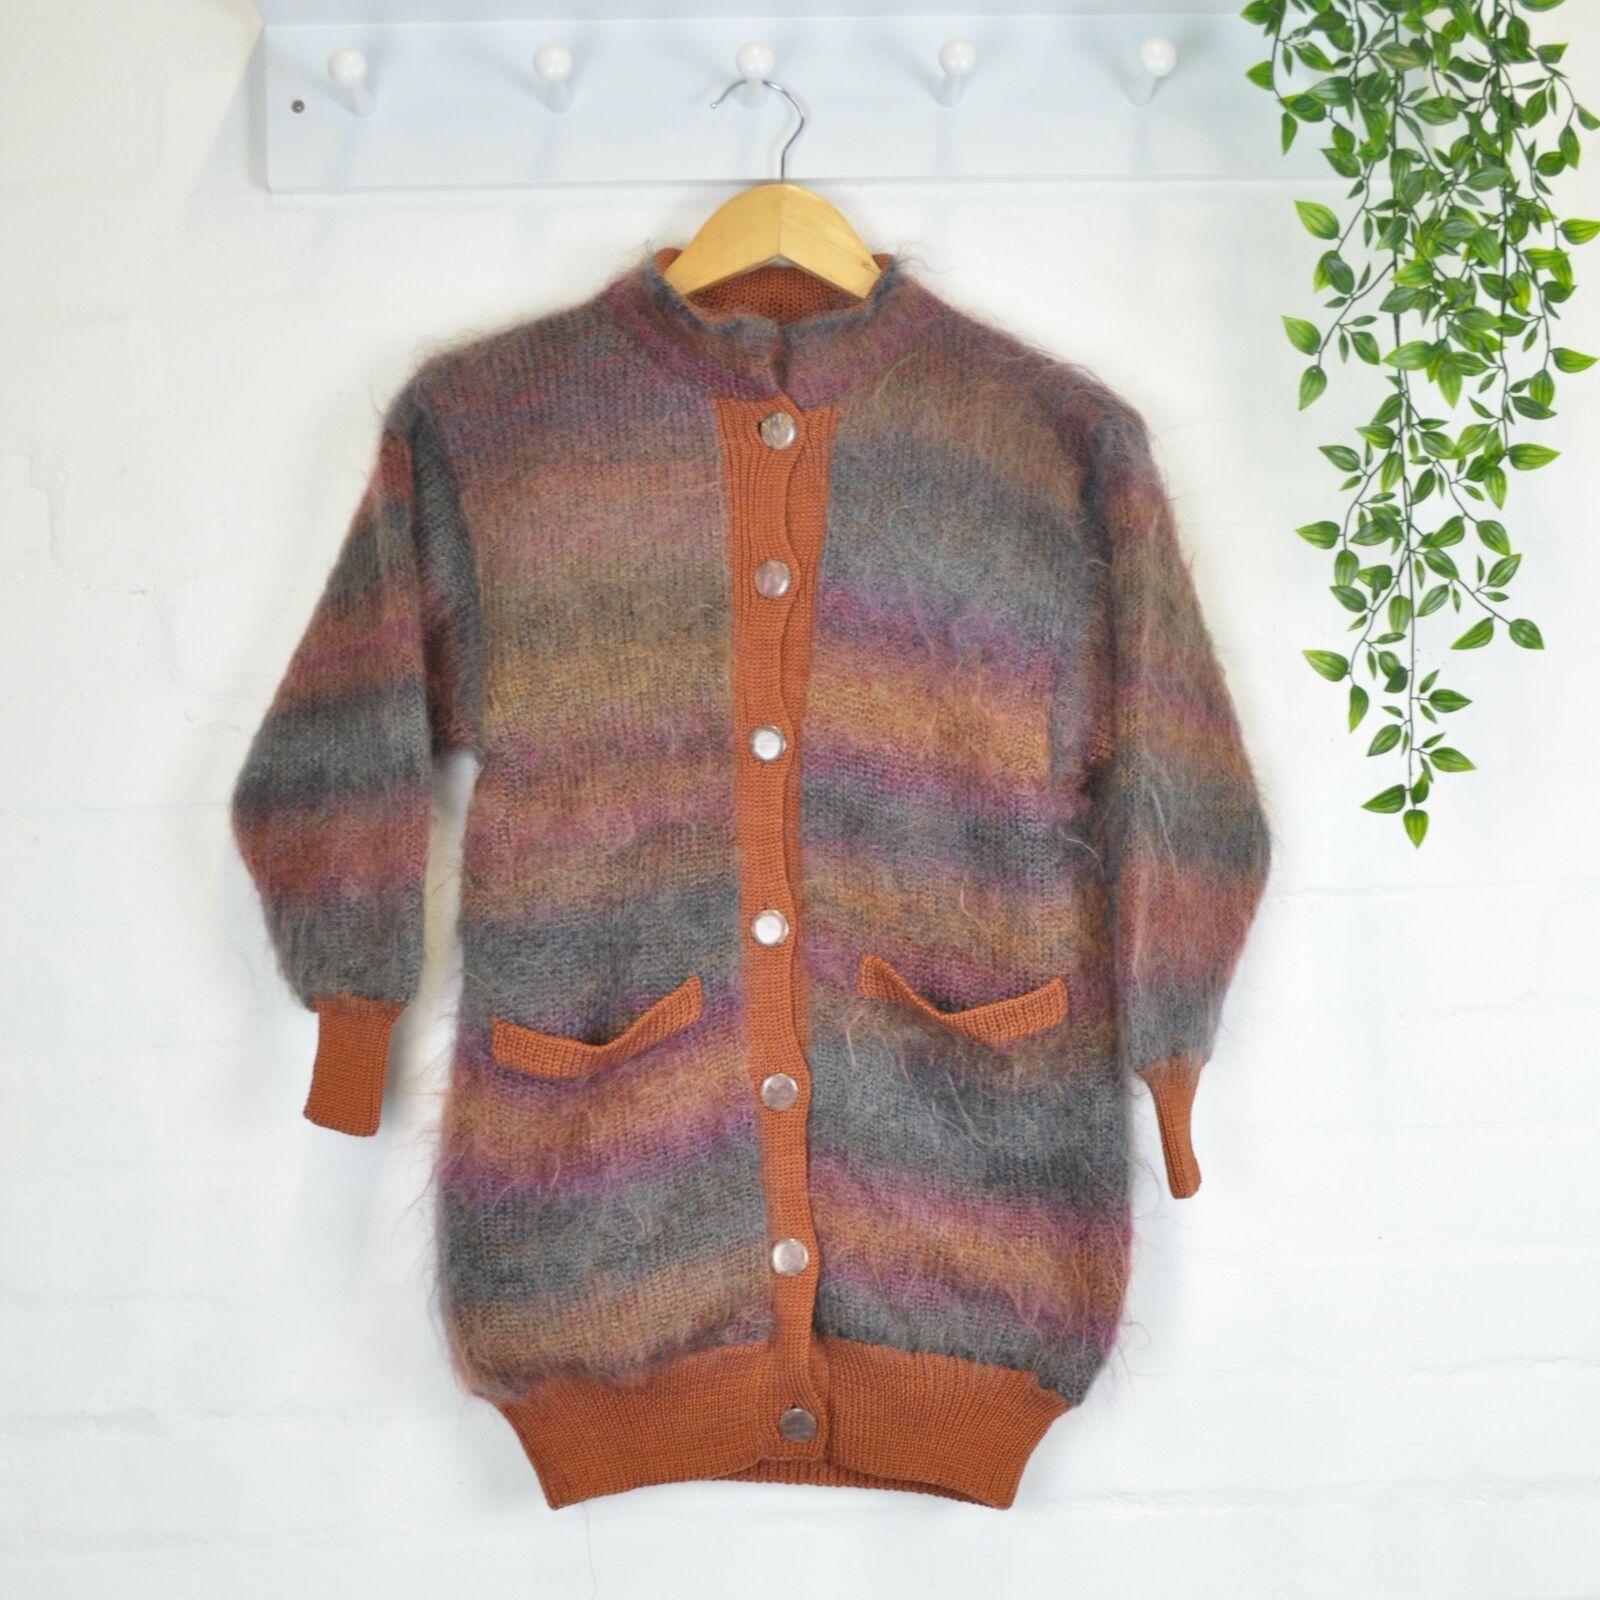 Vintage 80's fluffy off rainbow angora cardigan xs/s cottagecore brown-show original title